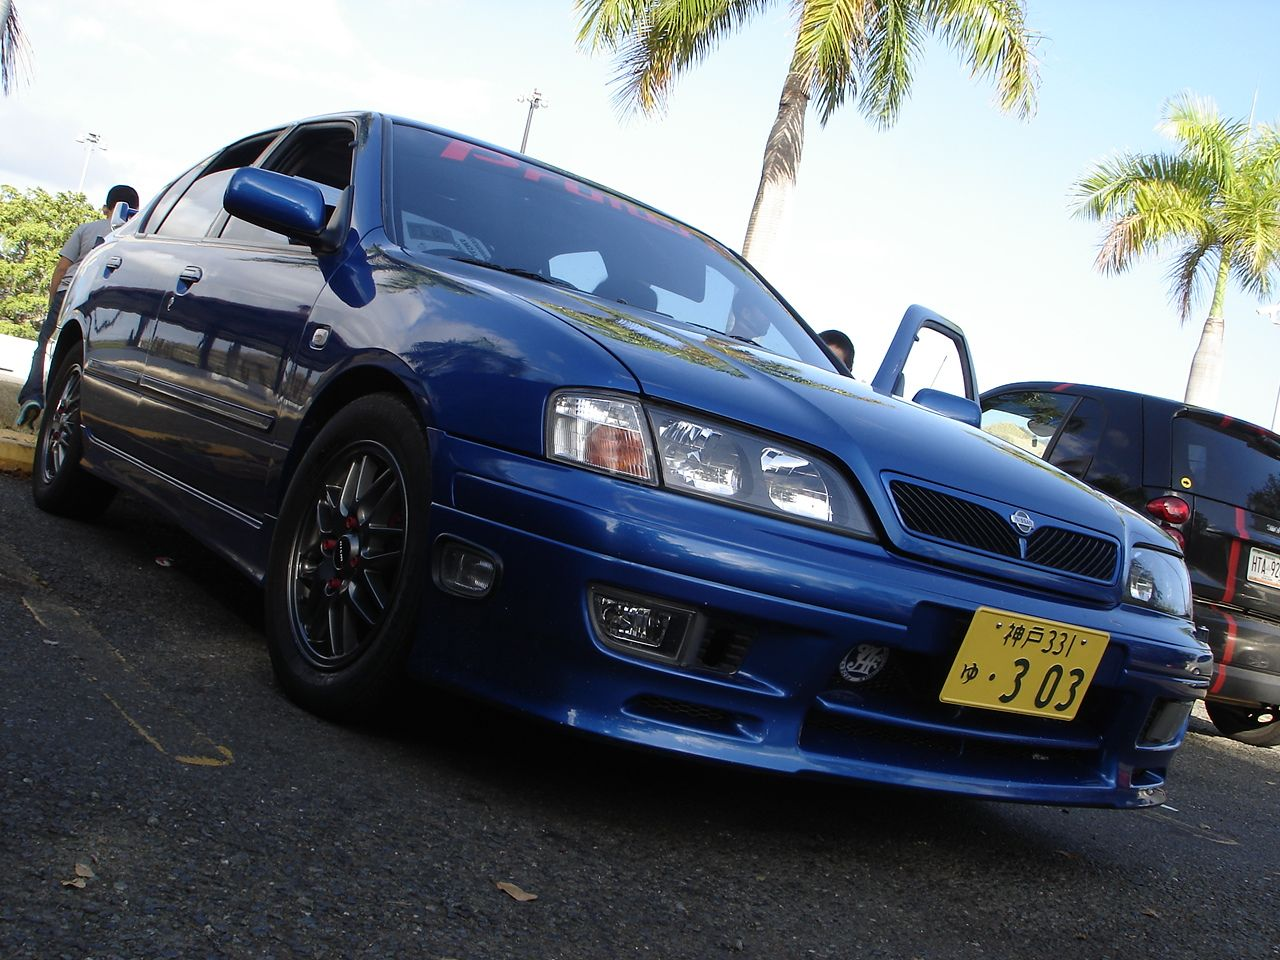 18 best nissan primera images on pinterest car automobile and jdm nissan primera vanachro Gallery